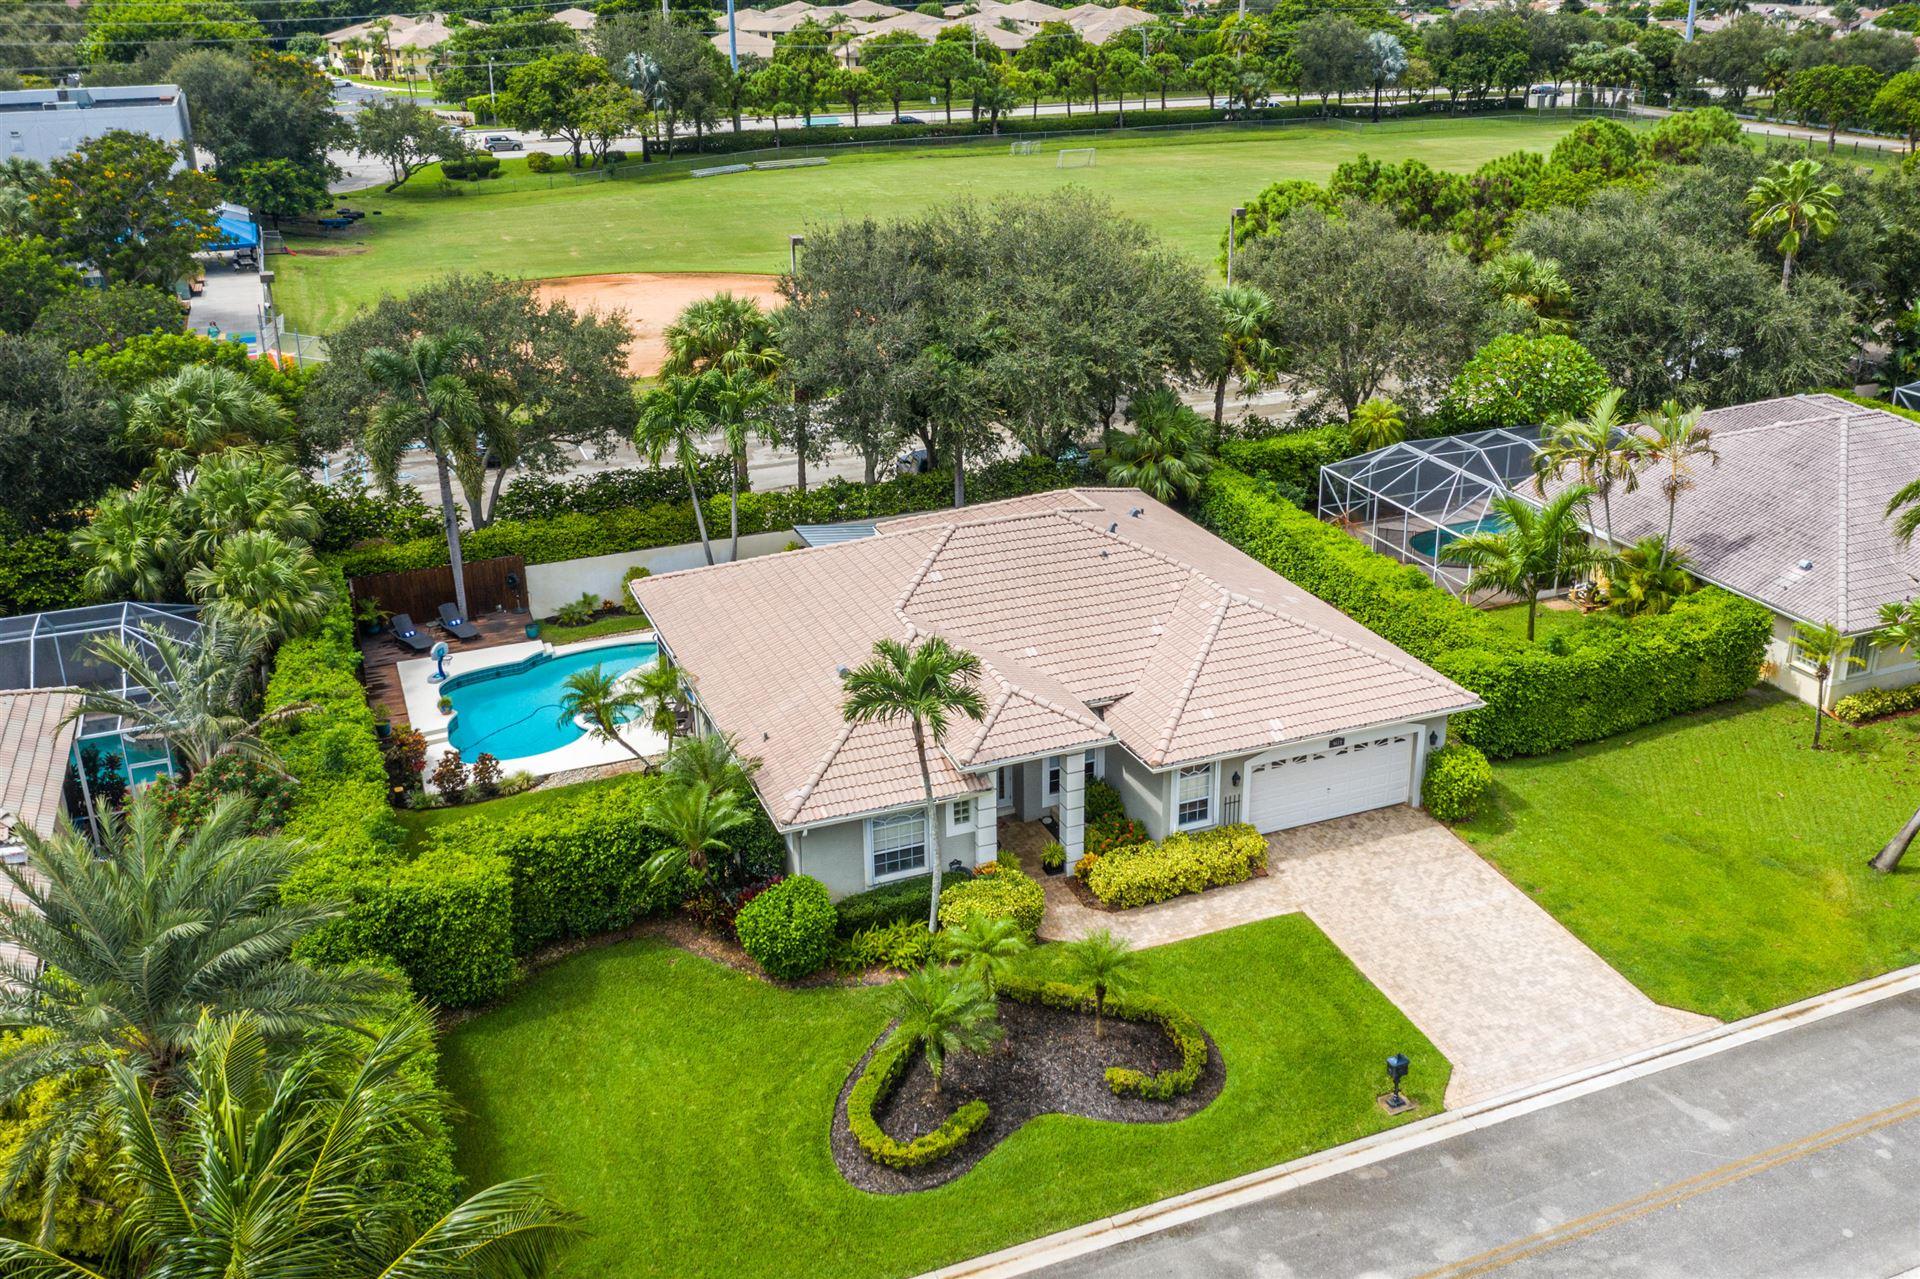 Photo of 9611 Aloe Road, Boynton Beach, FL 33436 (MLS # RX-10658240)